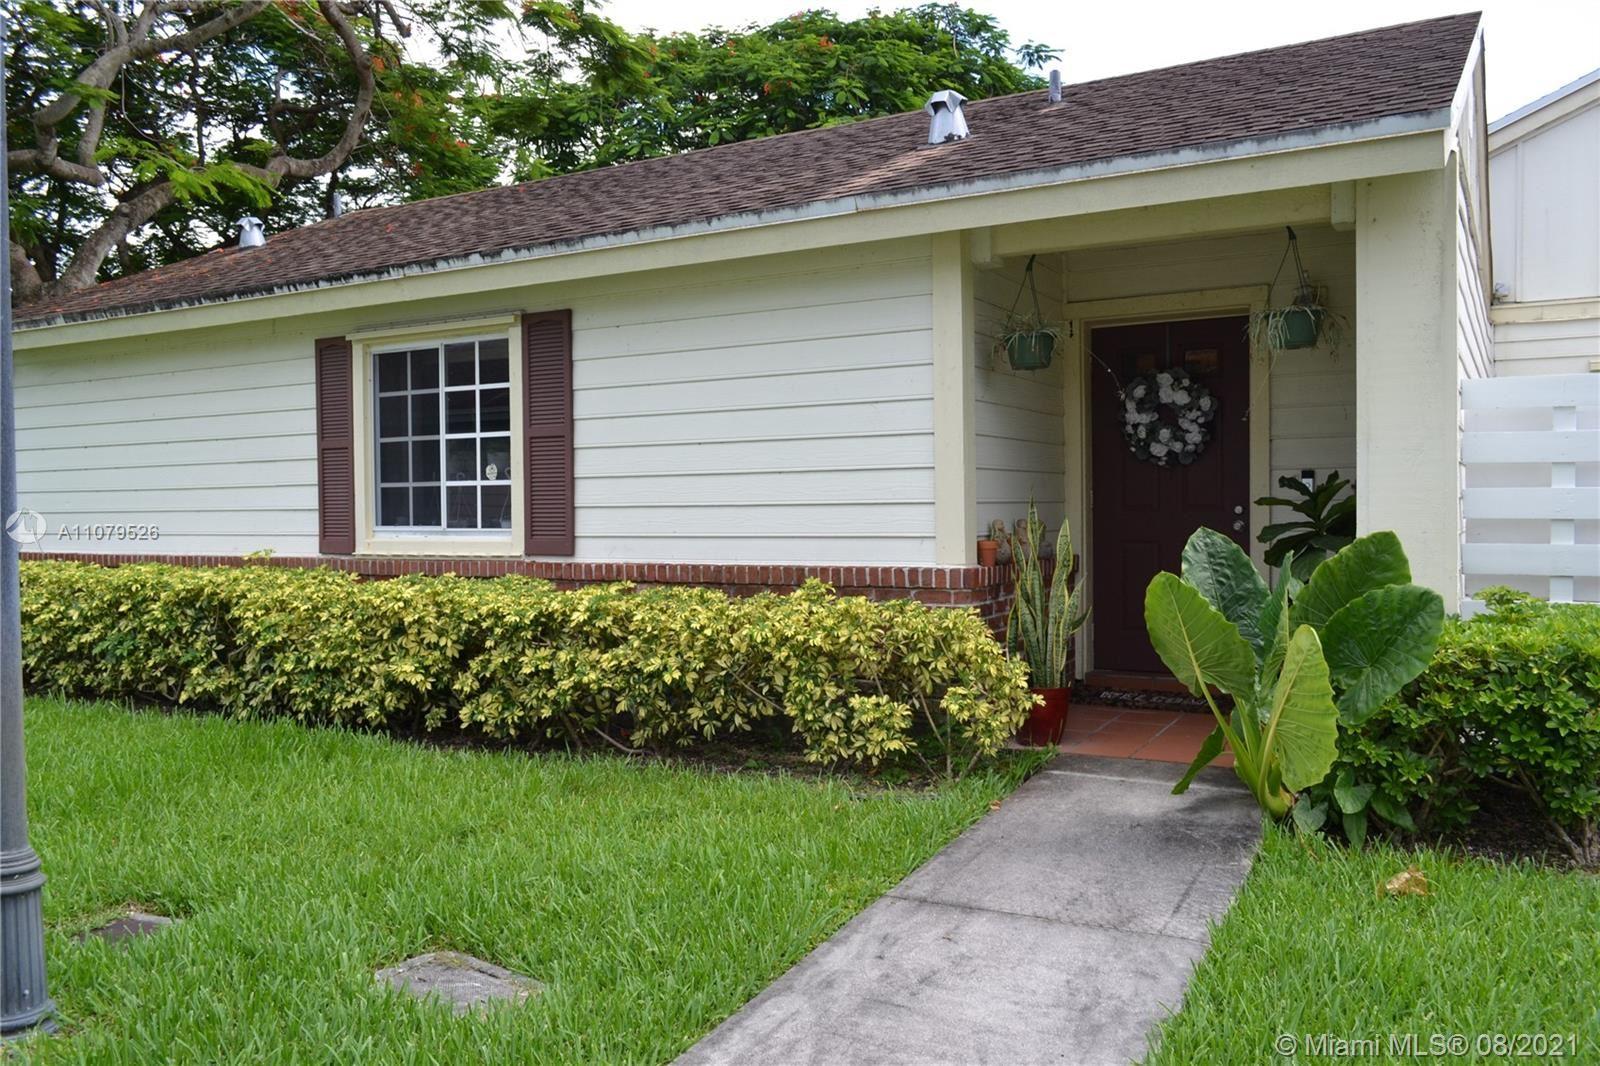 13716 SW 149th Circle Ln #161, Miami, FL 33186 - #: A11079526